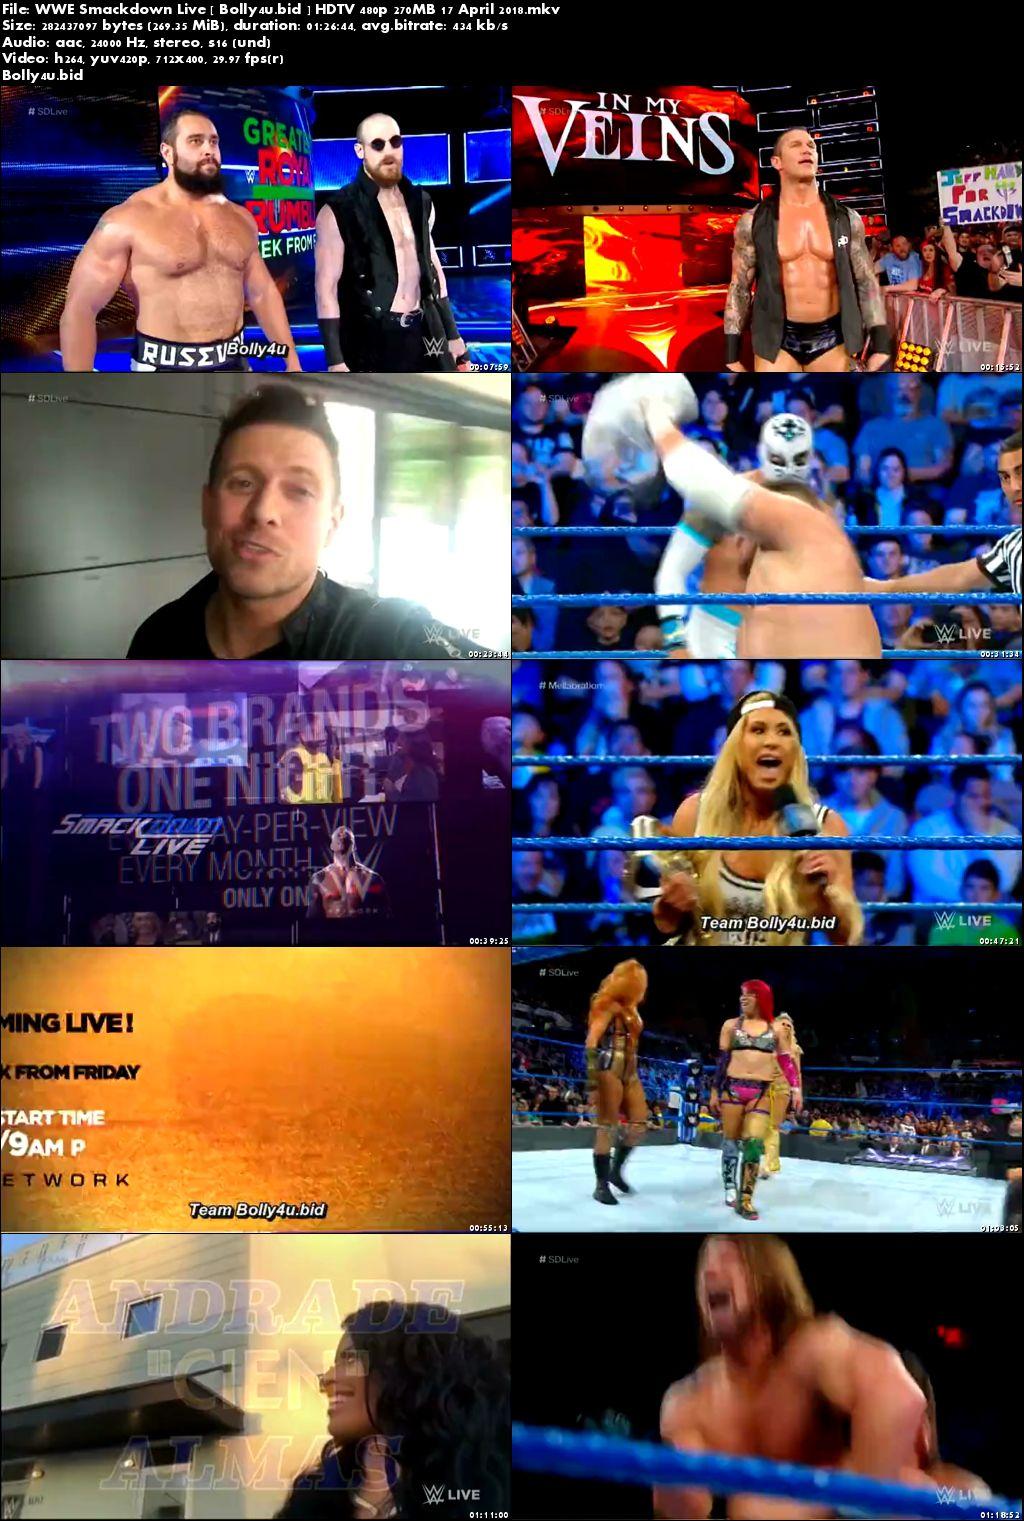 WWE Smackdown Live HDTV 480p 250MB 18 April 2018 Download